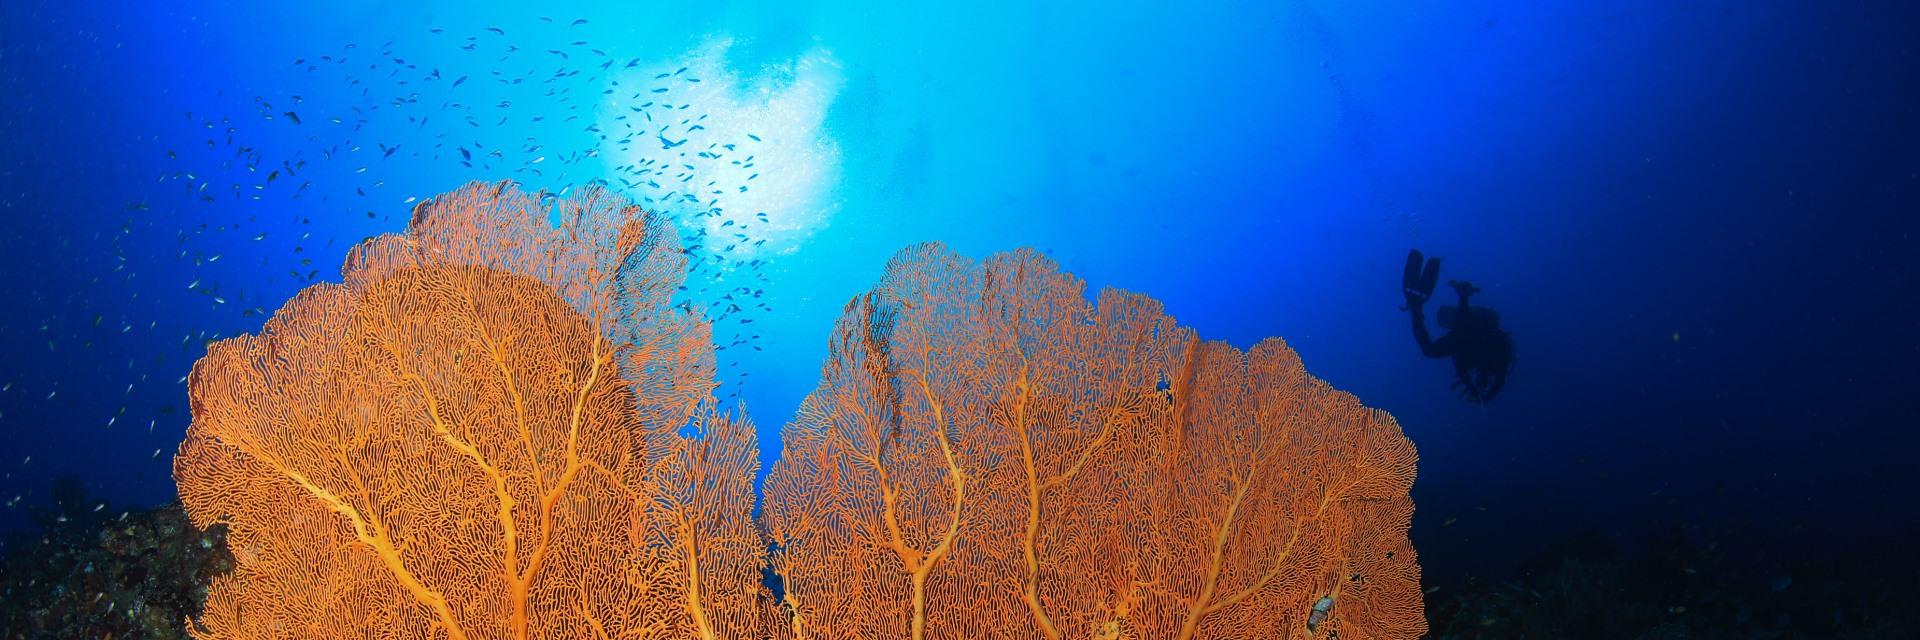 Taman Laut Pulau Rubiah Si Cantik Kota Sabang Taman Laut Pulau Rubiah Si Cantik Kota Sabang 2 - Dolan Dolen